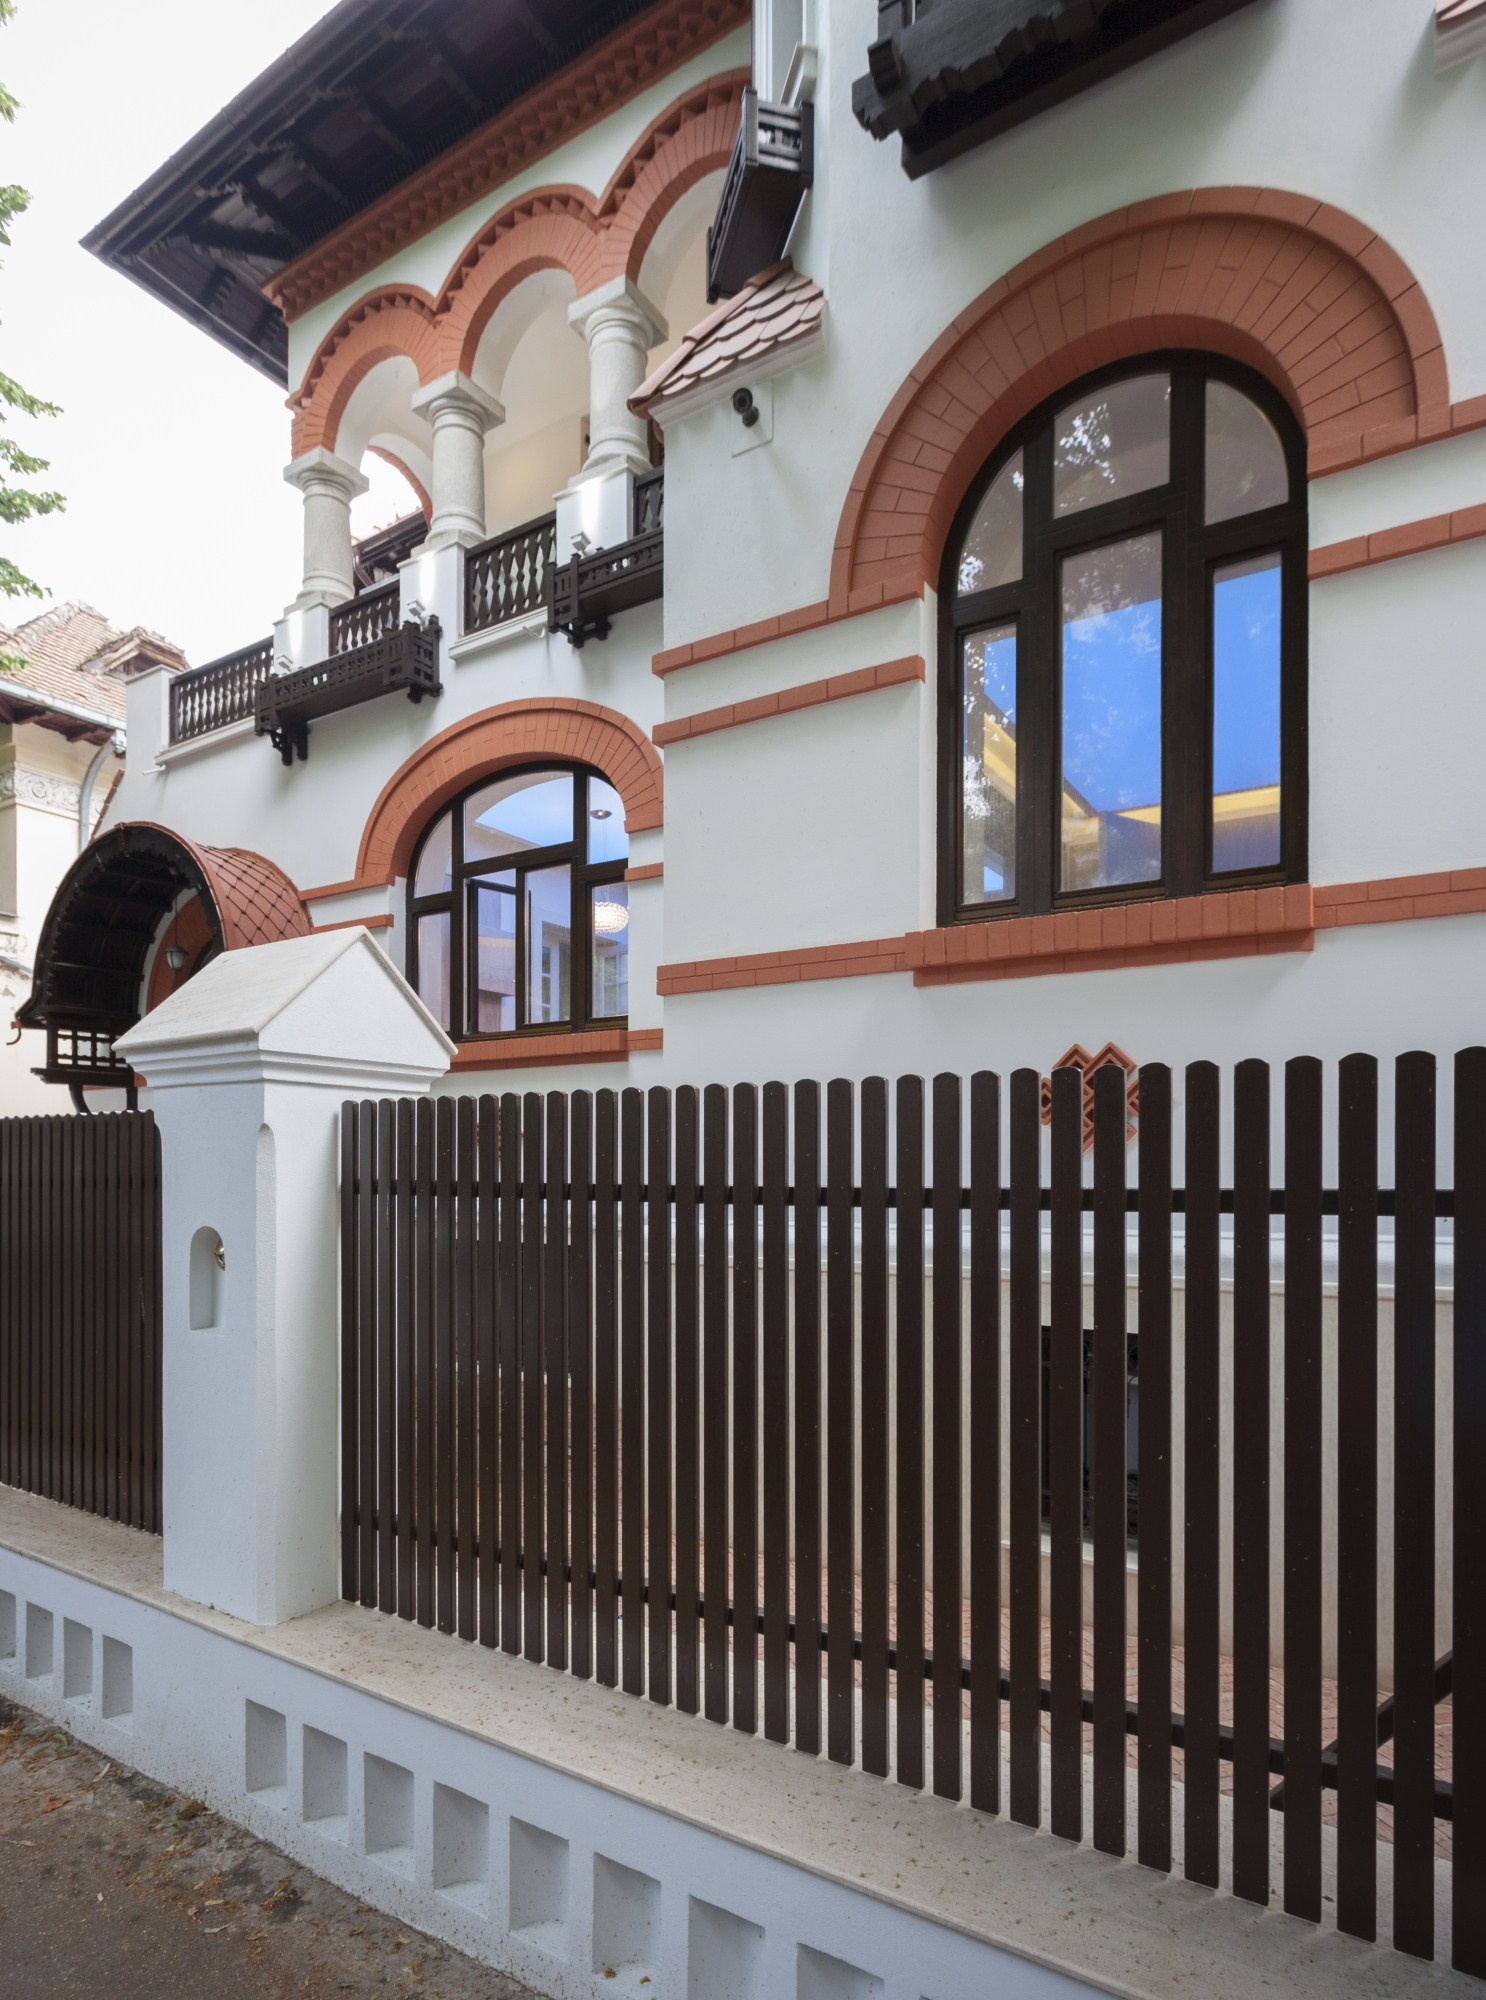 https://nbc-arhitect.ro/wp-content/uploads/2020/10/NBC-Arhitect-_-restorations-_-Washington-House-_-Bucharest-Romania_42.jpg